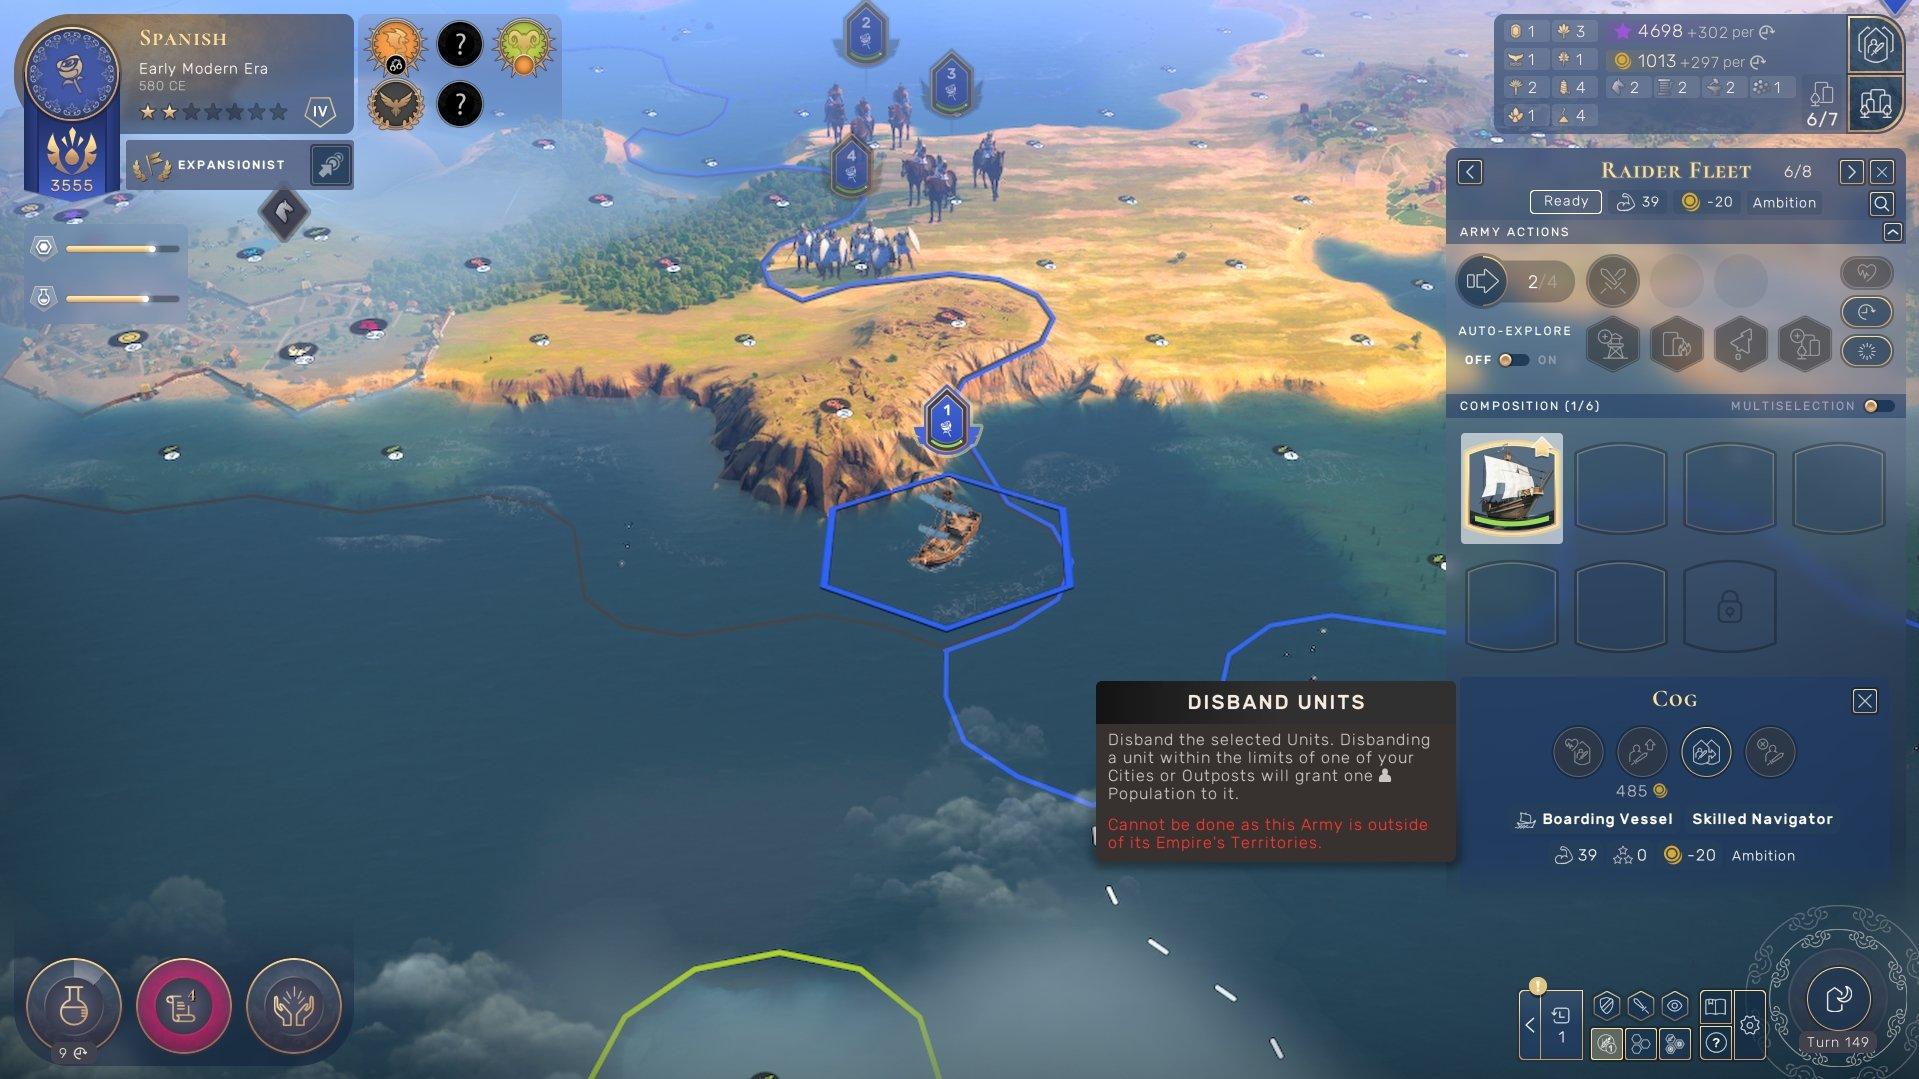 Humankind - Can't Disband Unit Screenshot